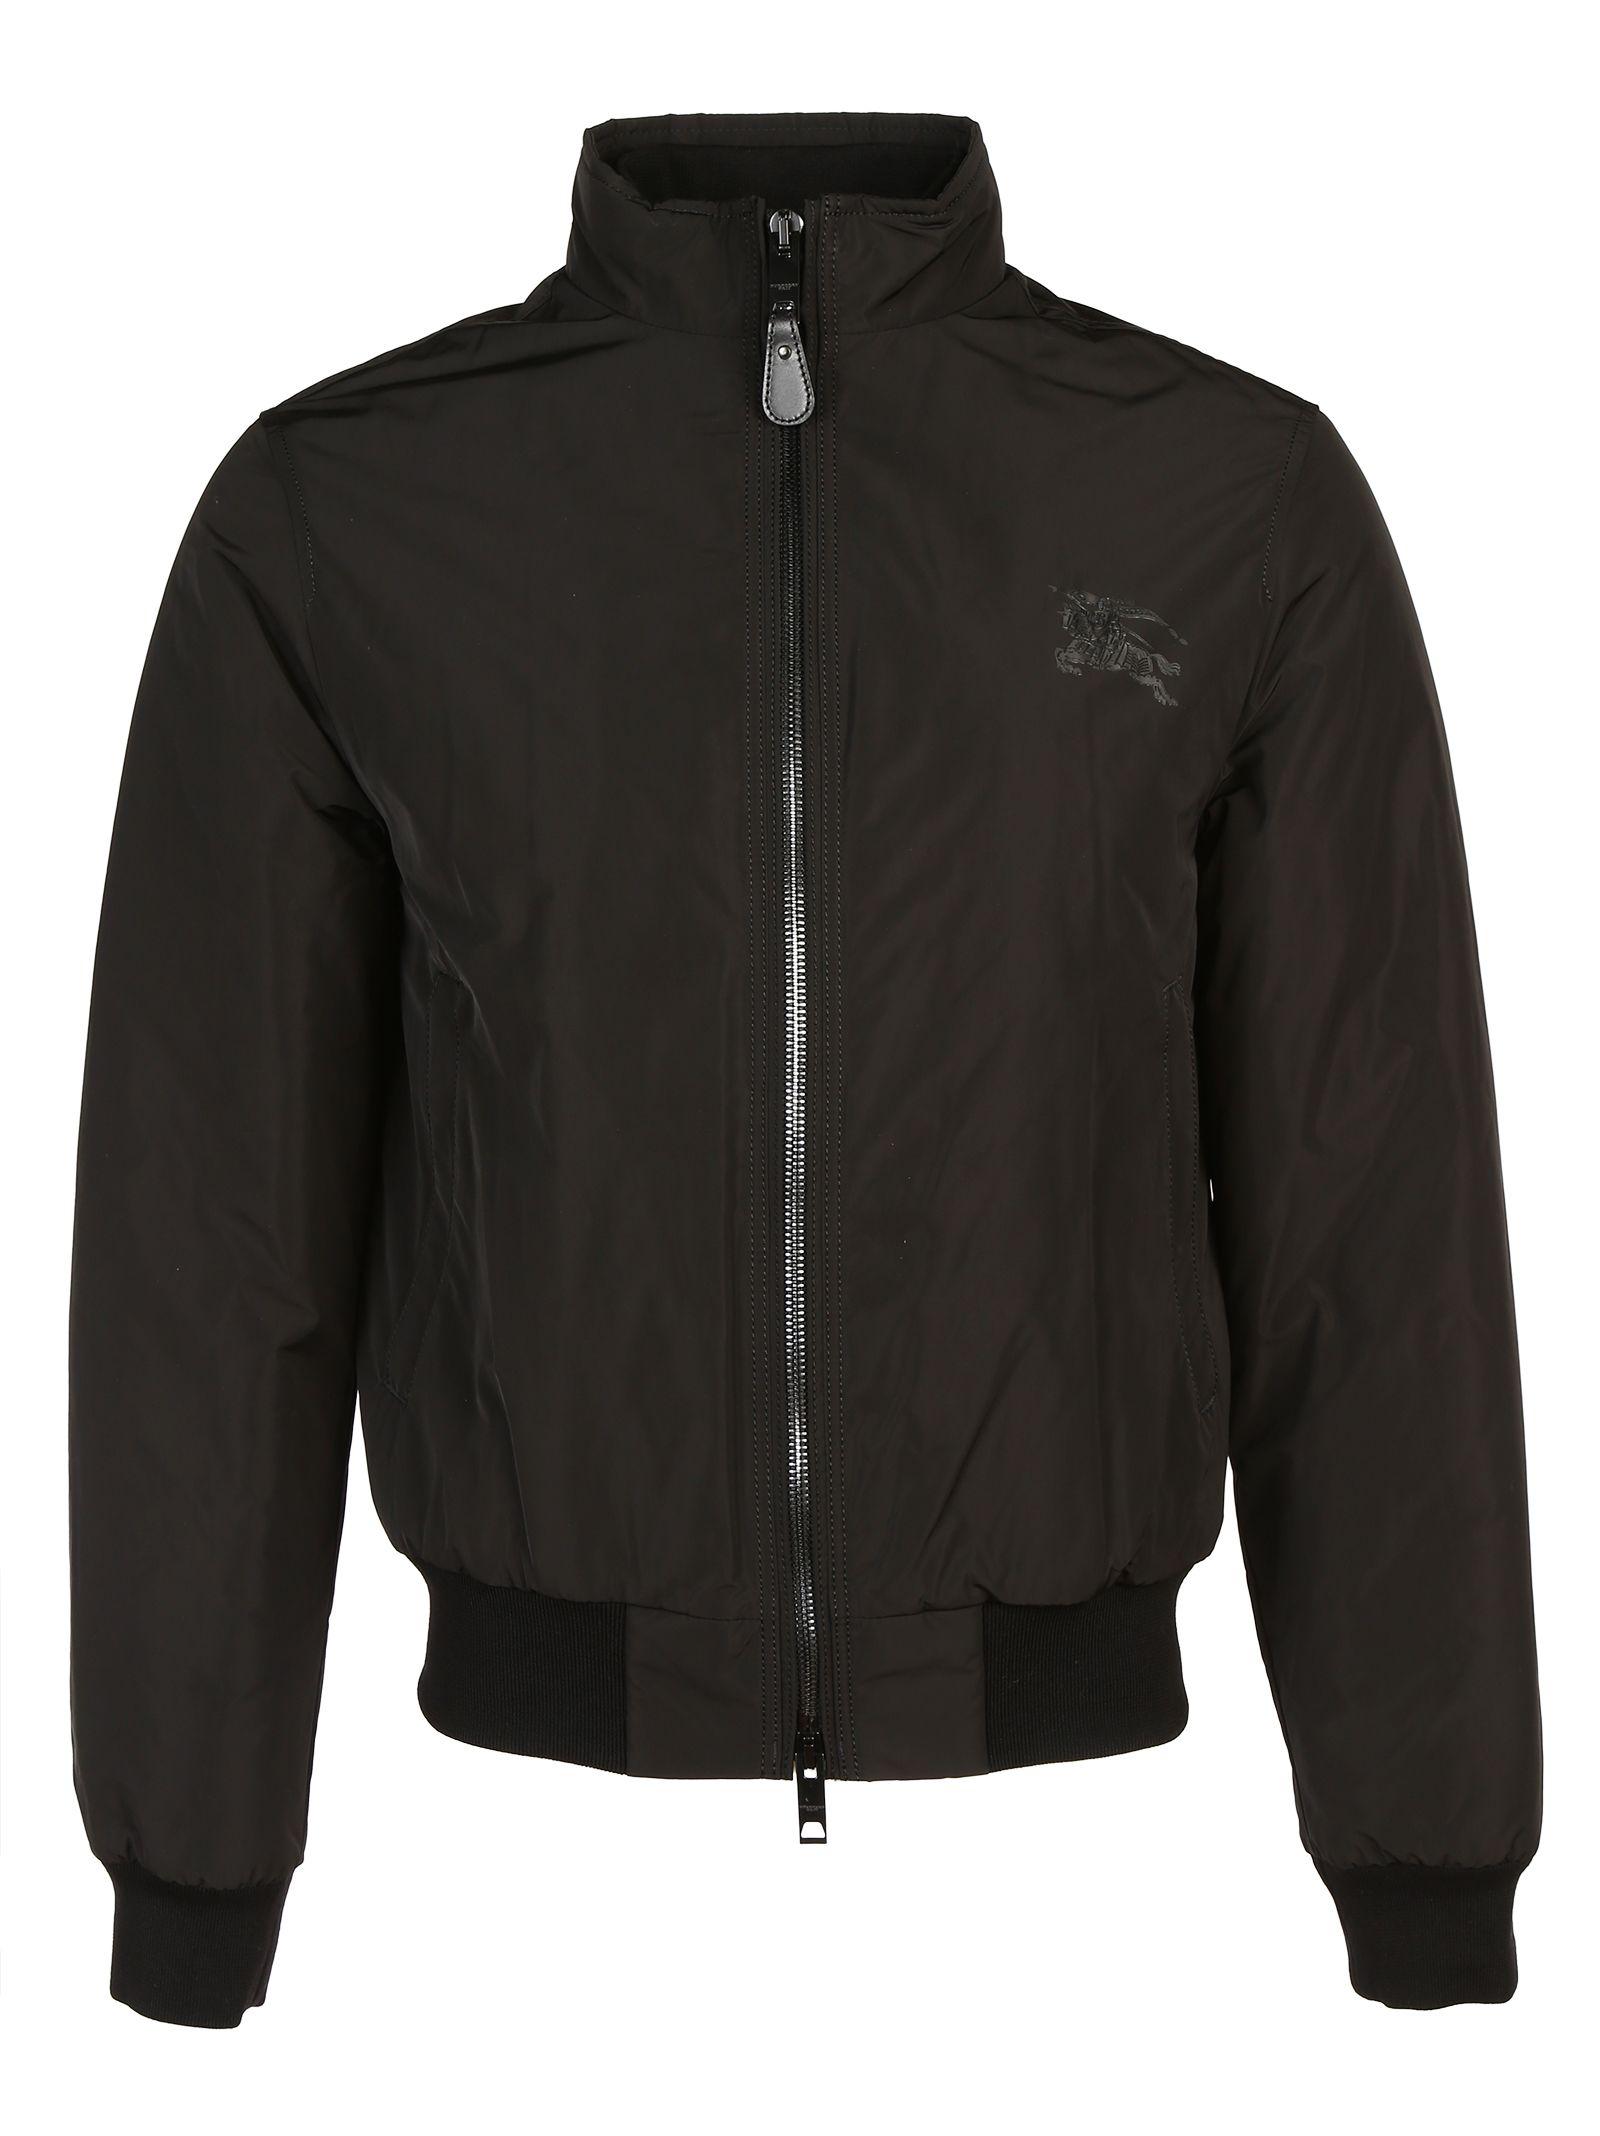 burberry brit burberry brit nylon quilted jacket black men 39 s jackets italist. Black Bedroom Furniture Sets. Home Design Ideas